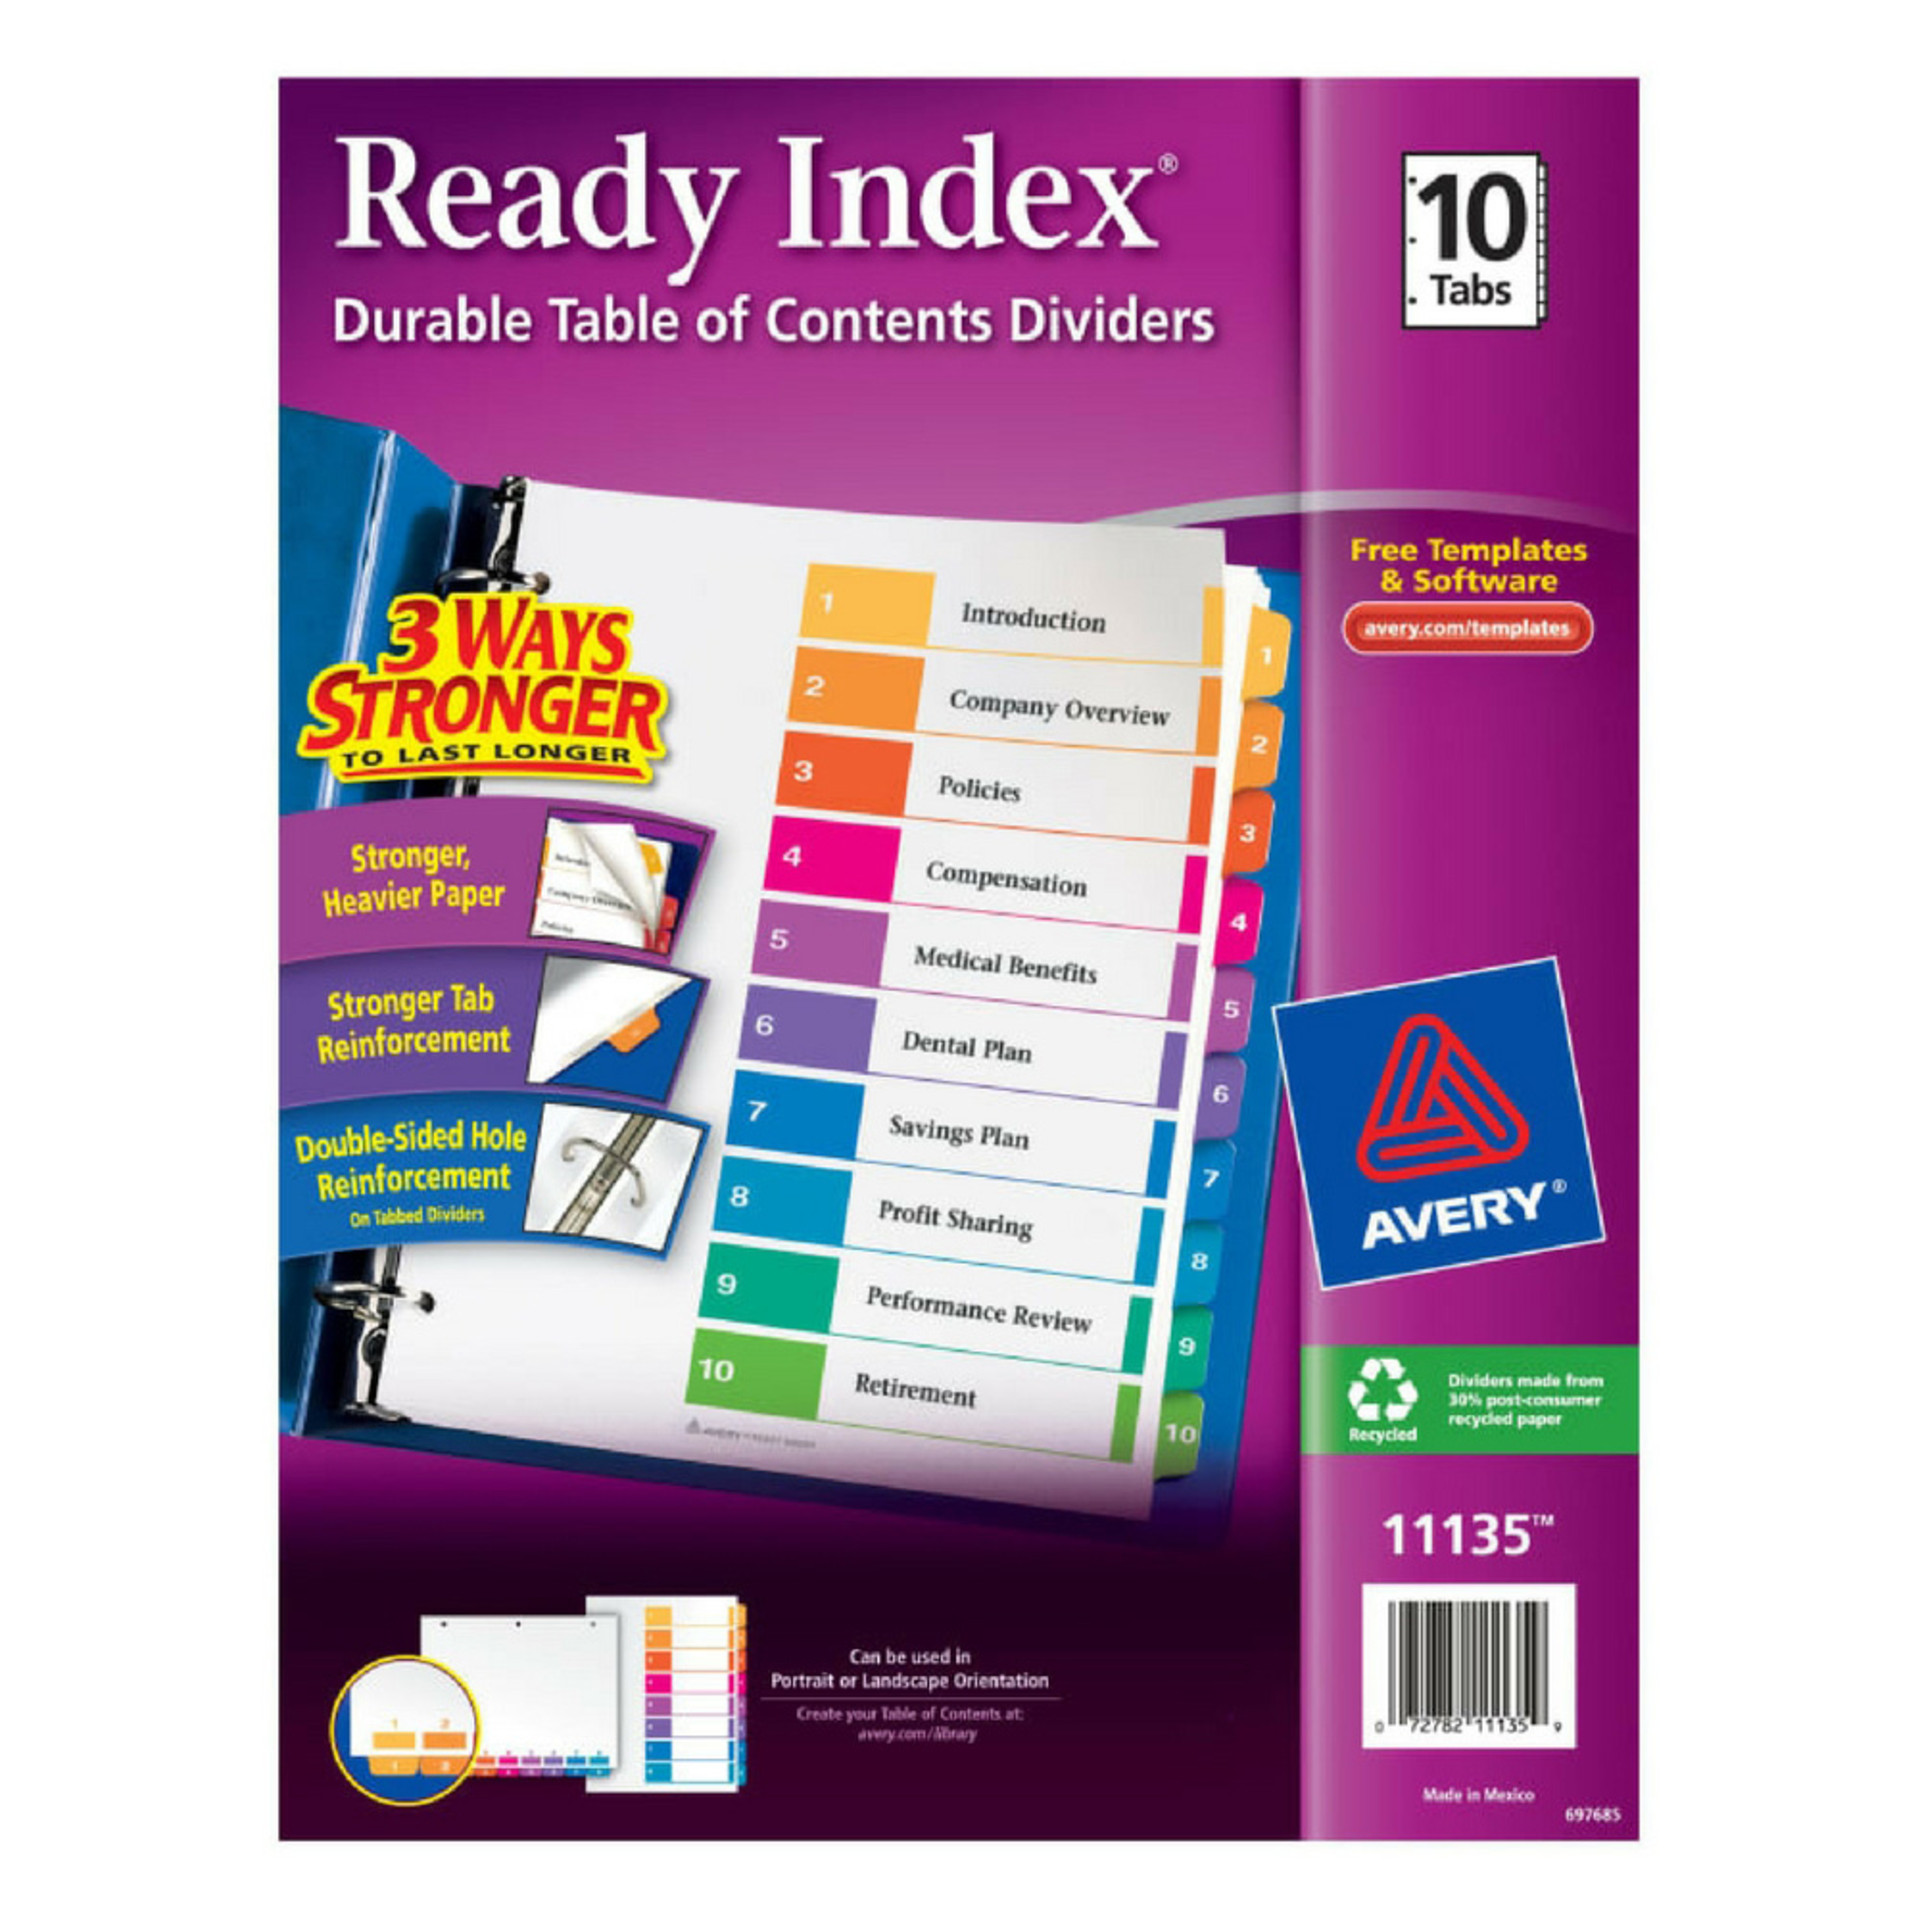 Avery Multicolor Customizable 10 Tab Binder Dividers